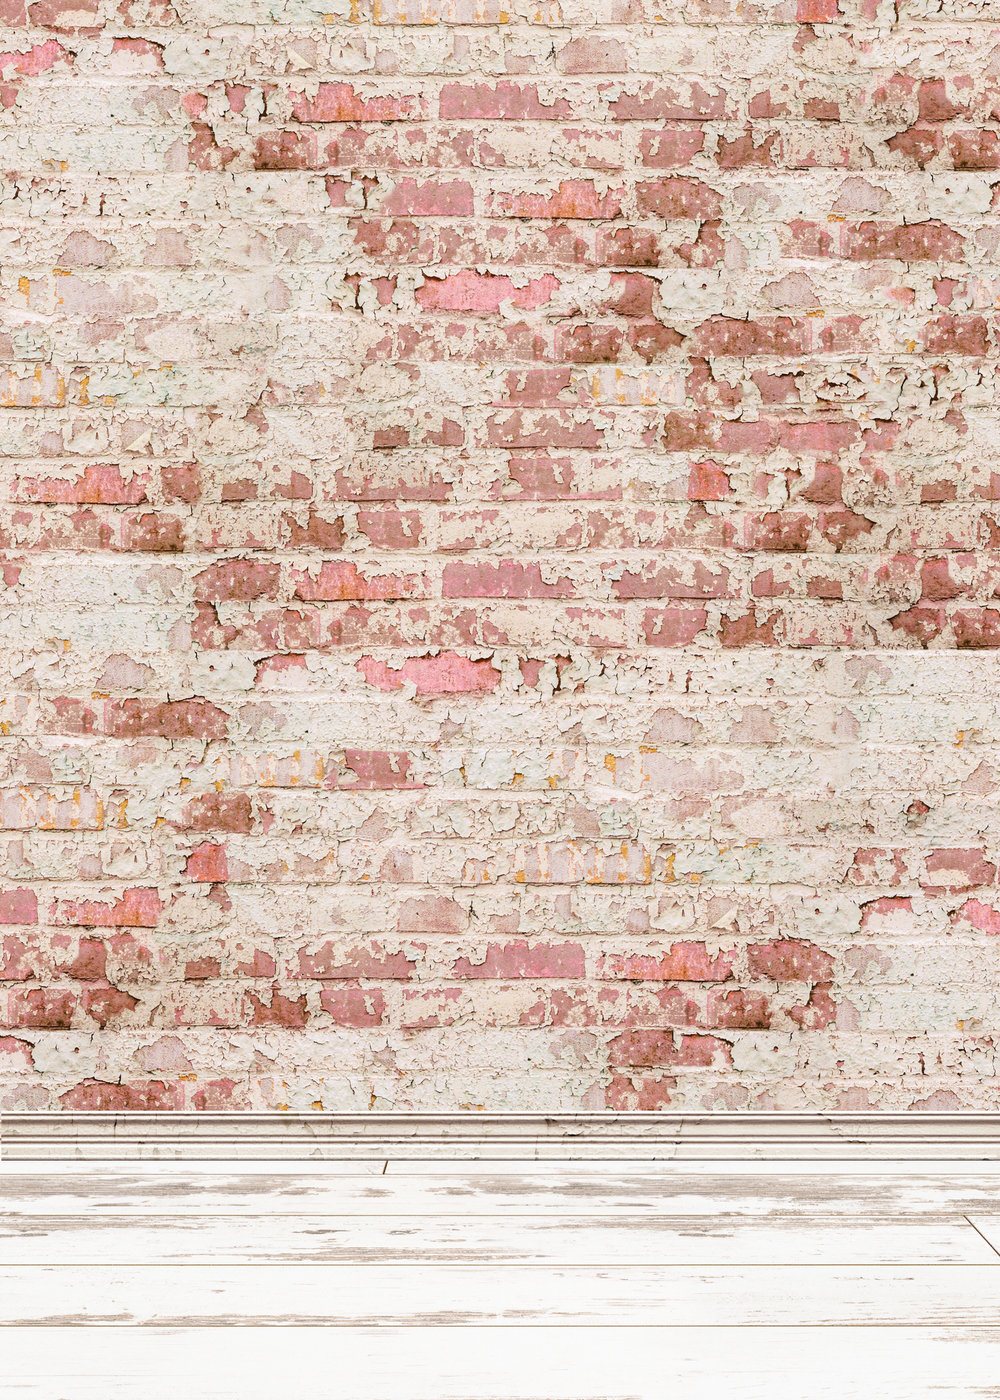 Background I - Pink Brick Wall